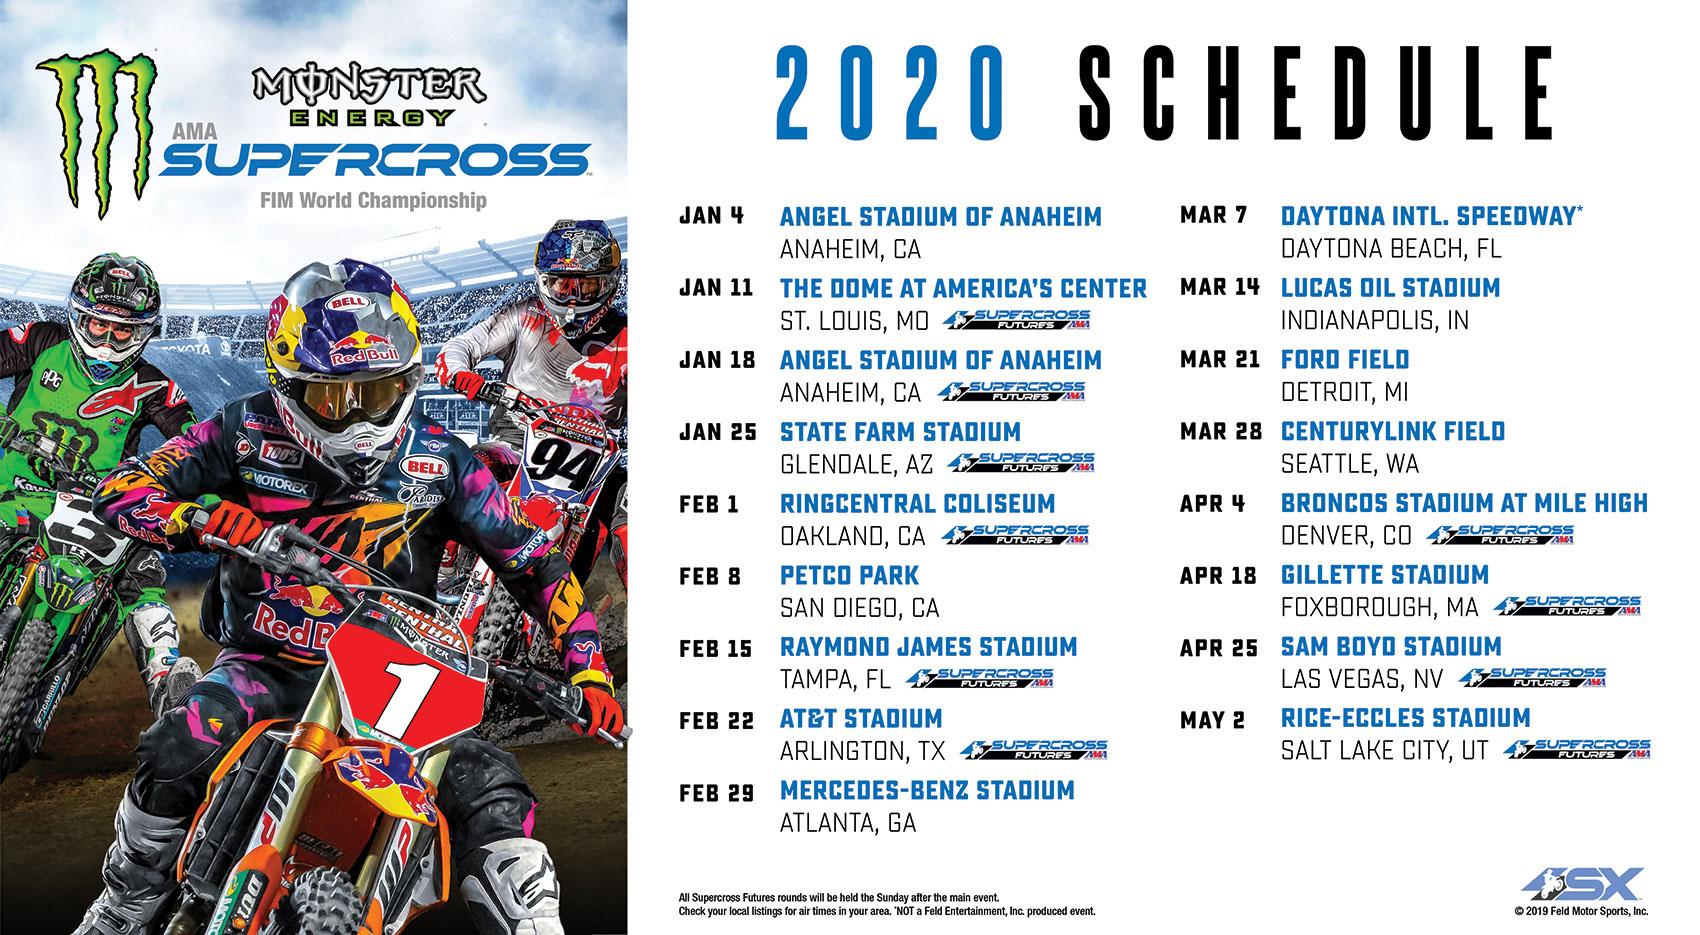 2020 Monster Energy Supercross Series Schedule - Swapmoto Live